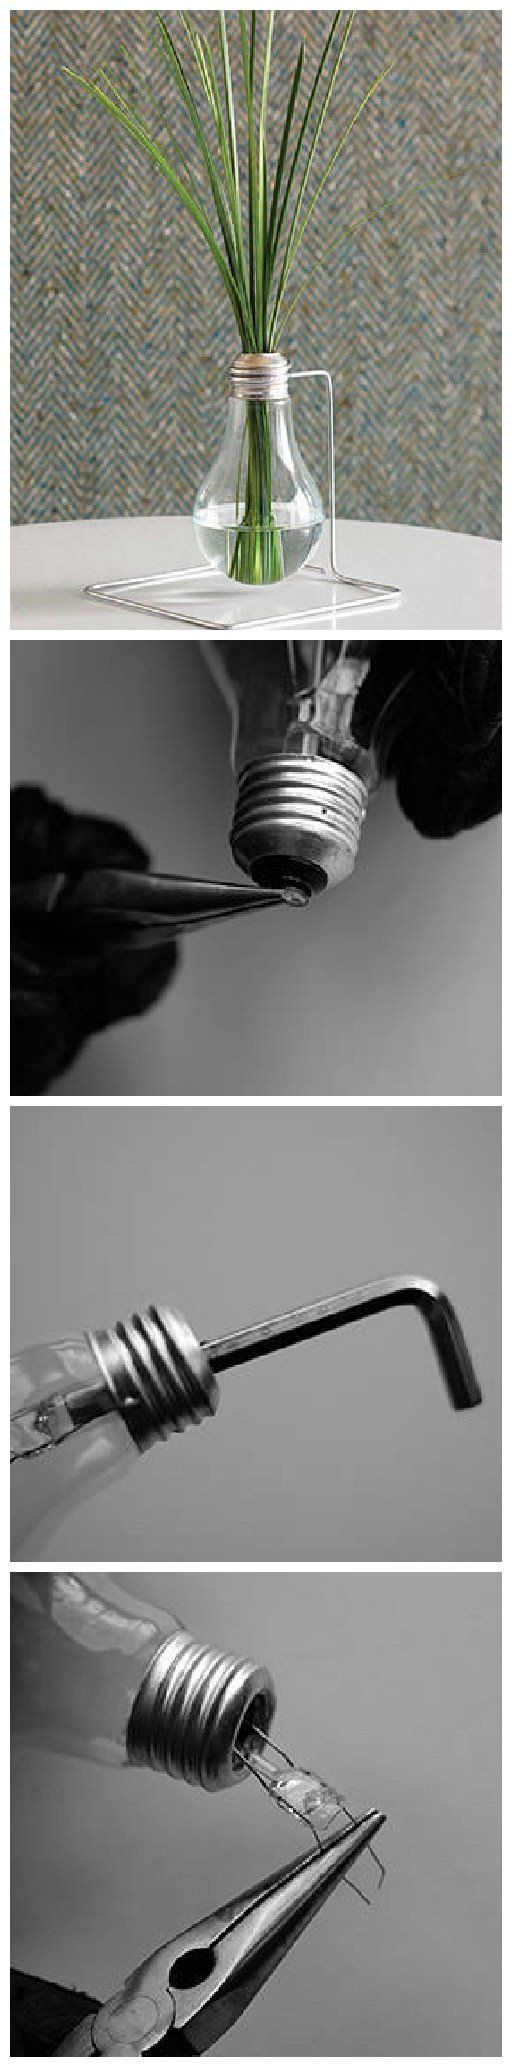 #Bulb, #DIY, #Light, #Vase